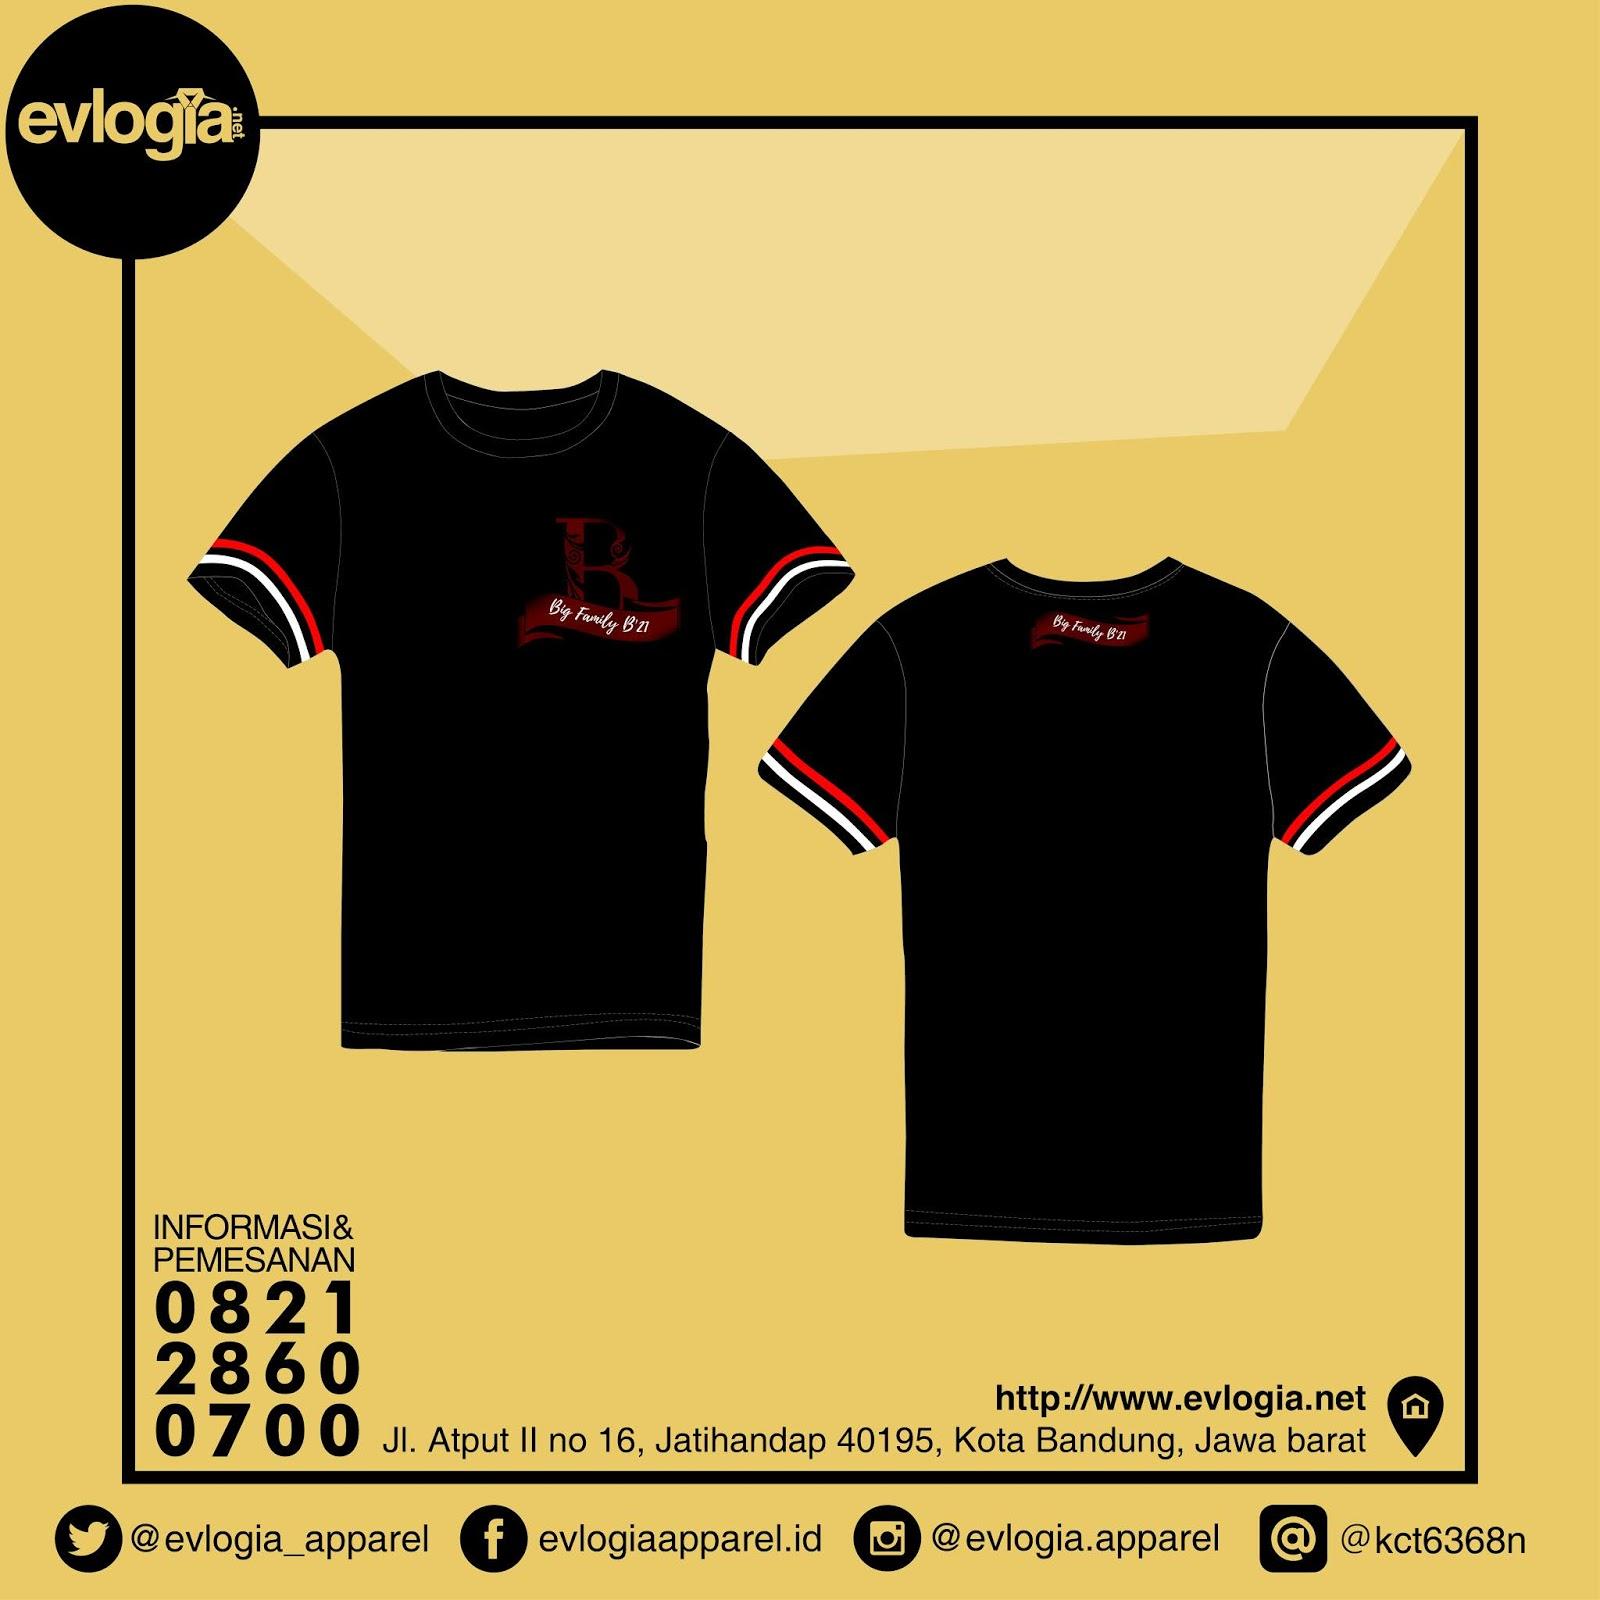 Bikin Baju / Kaos Murah Berkualitas Bandung - Model Anak Alumni